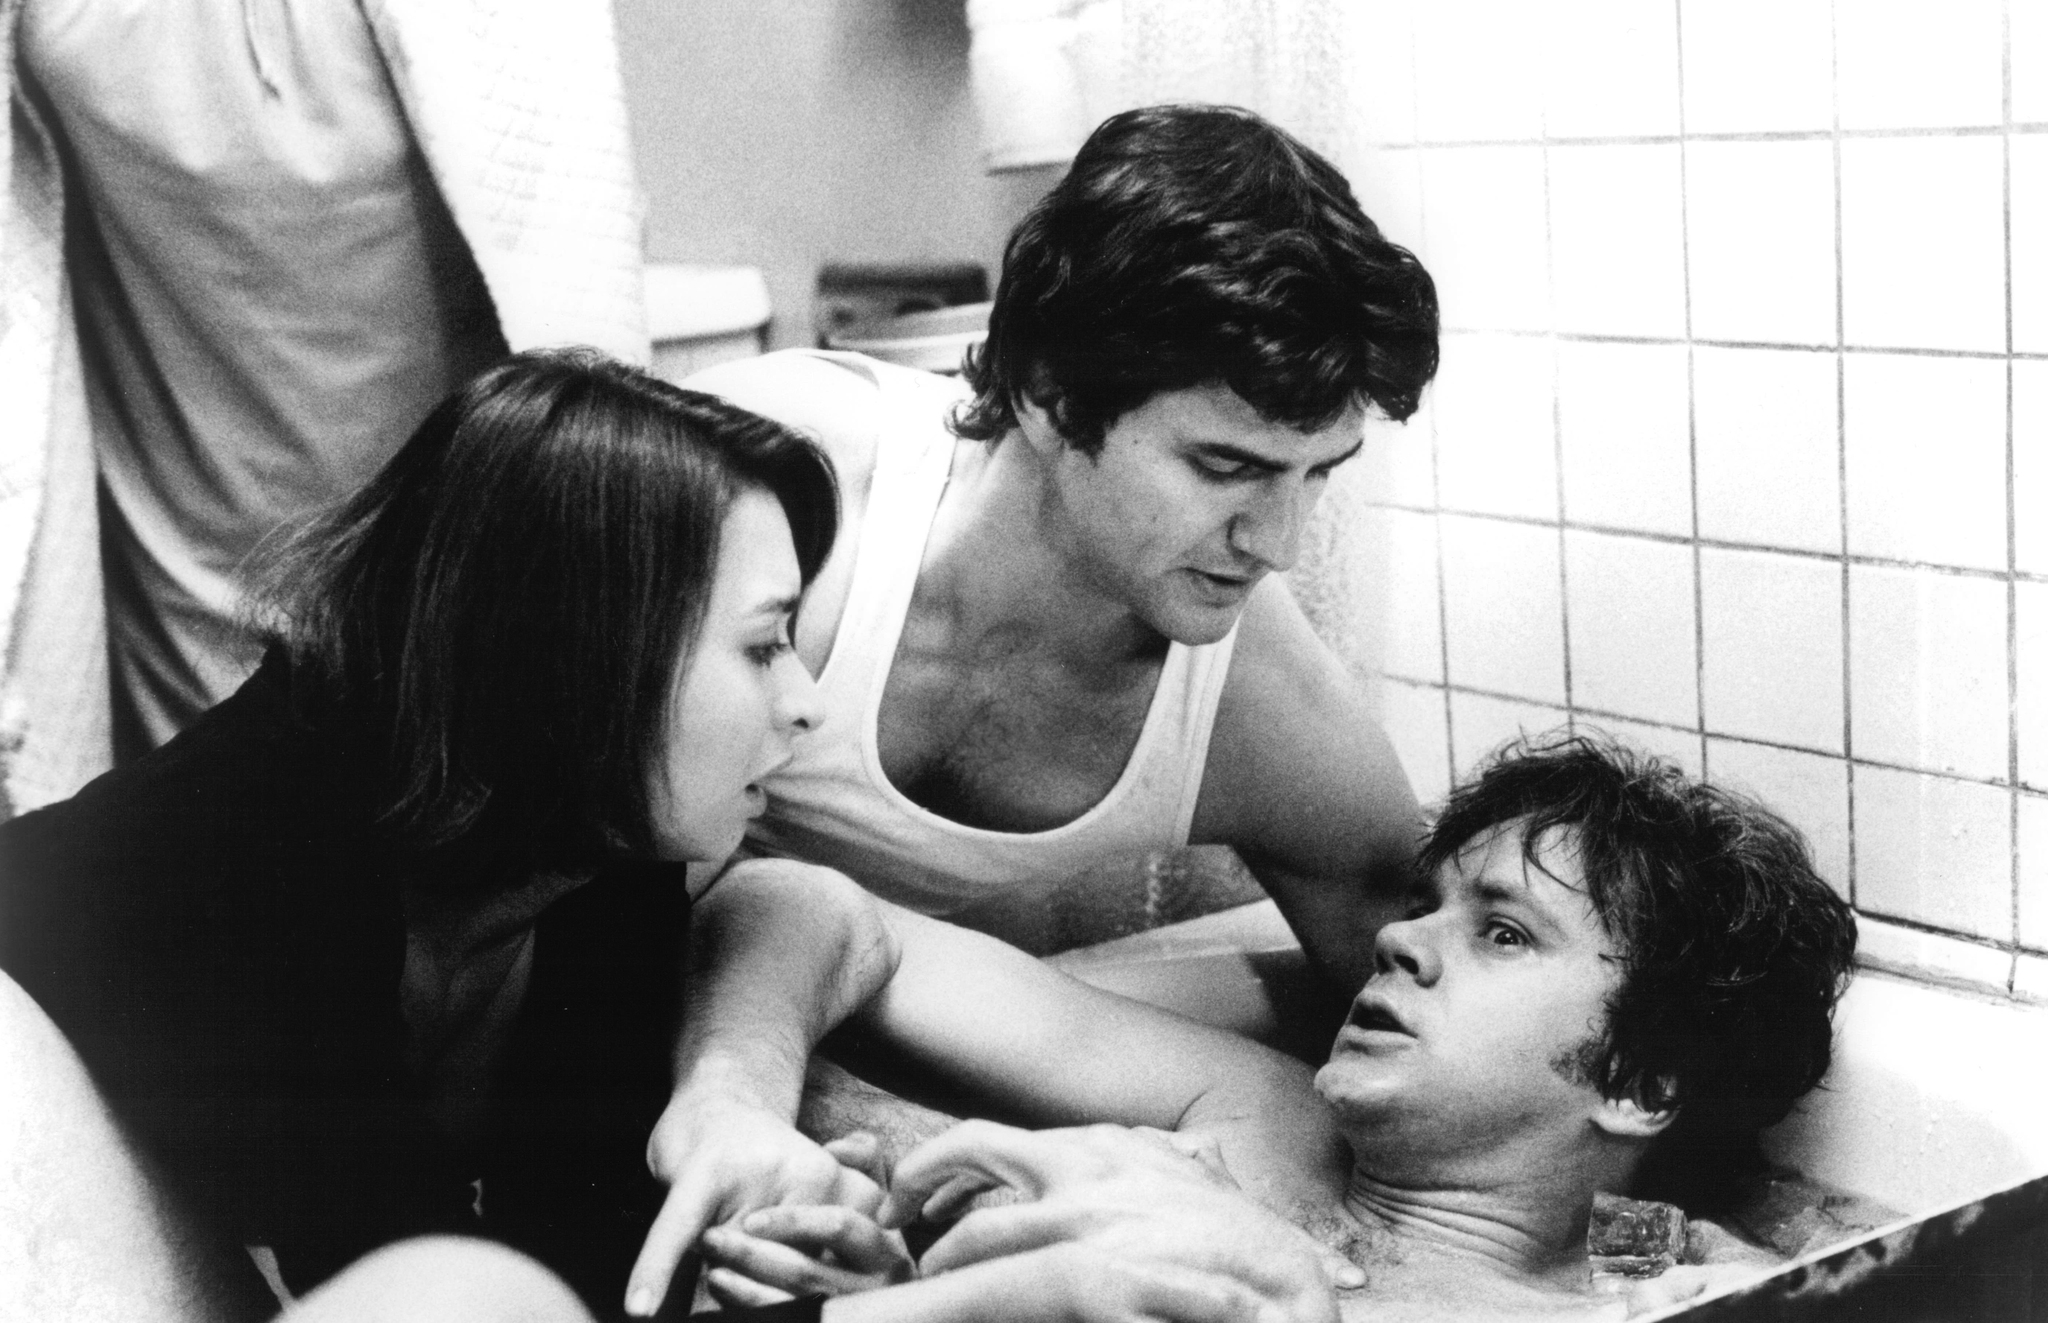 Tim Robbins, Elizabeth Peña, and Evan O'Meara in Jacob's Ladder (1990)